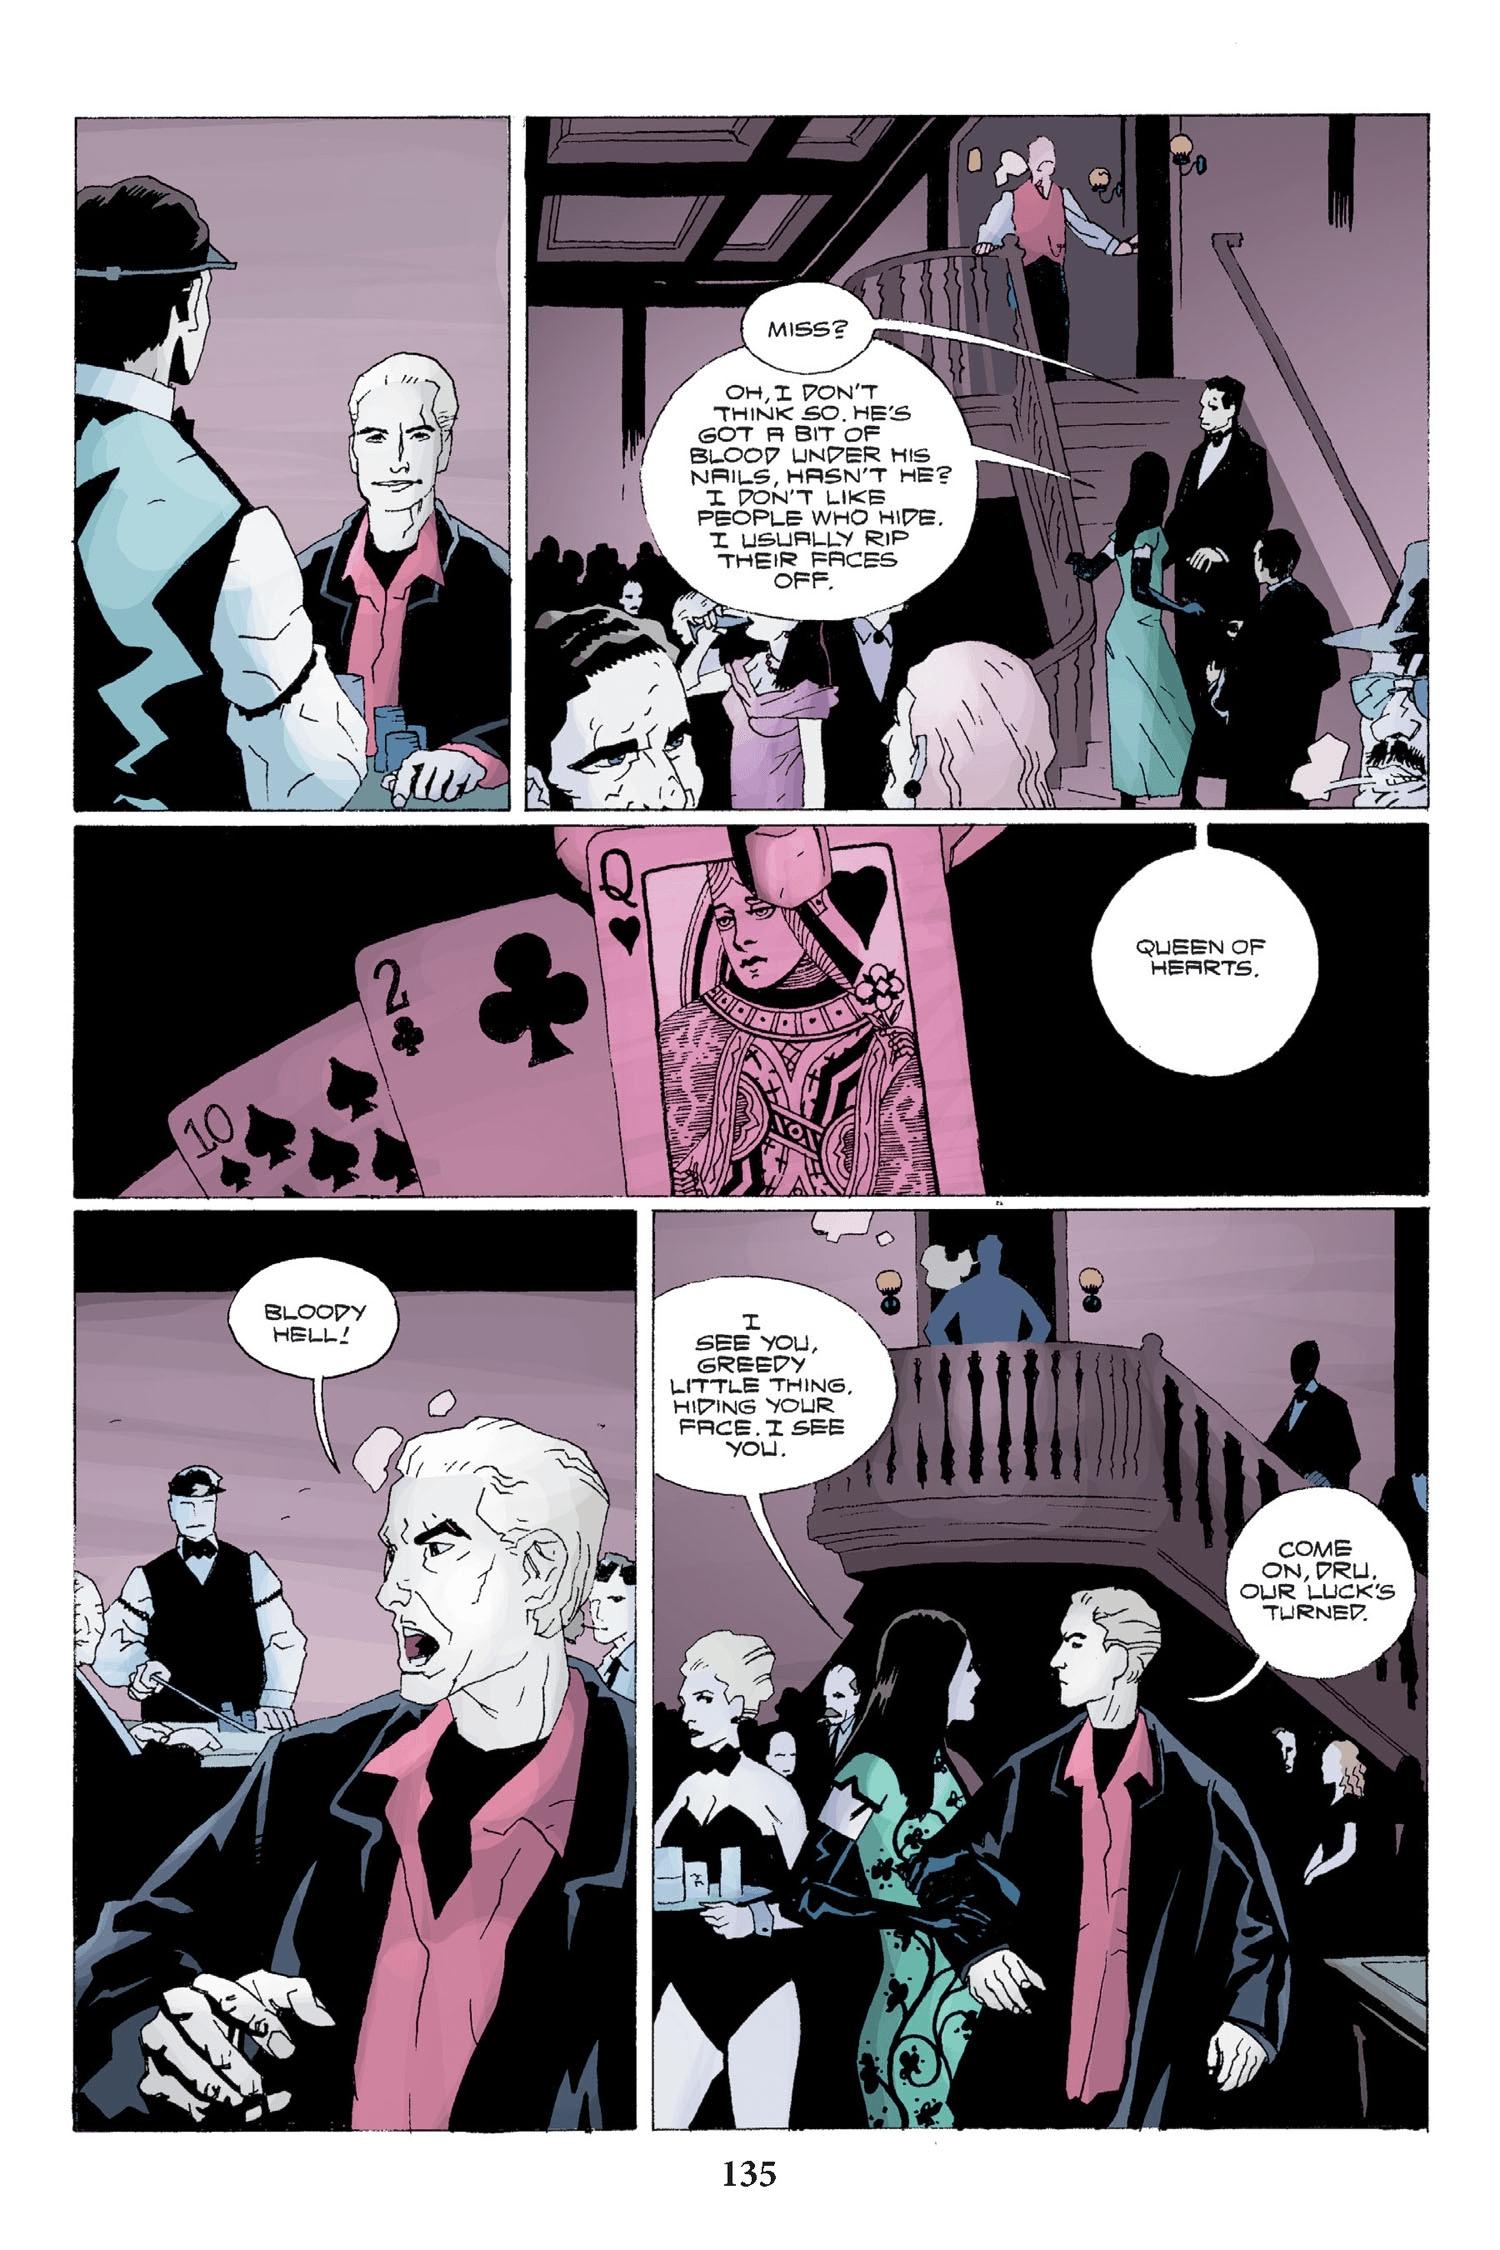 Read online Buffy the Vampire Slayer: Omnibus comic -  Issue # TPB 2 - 129